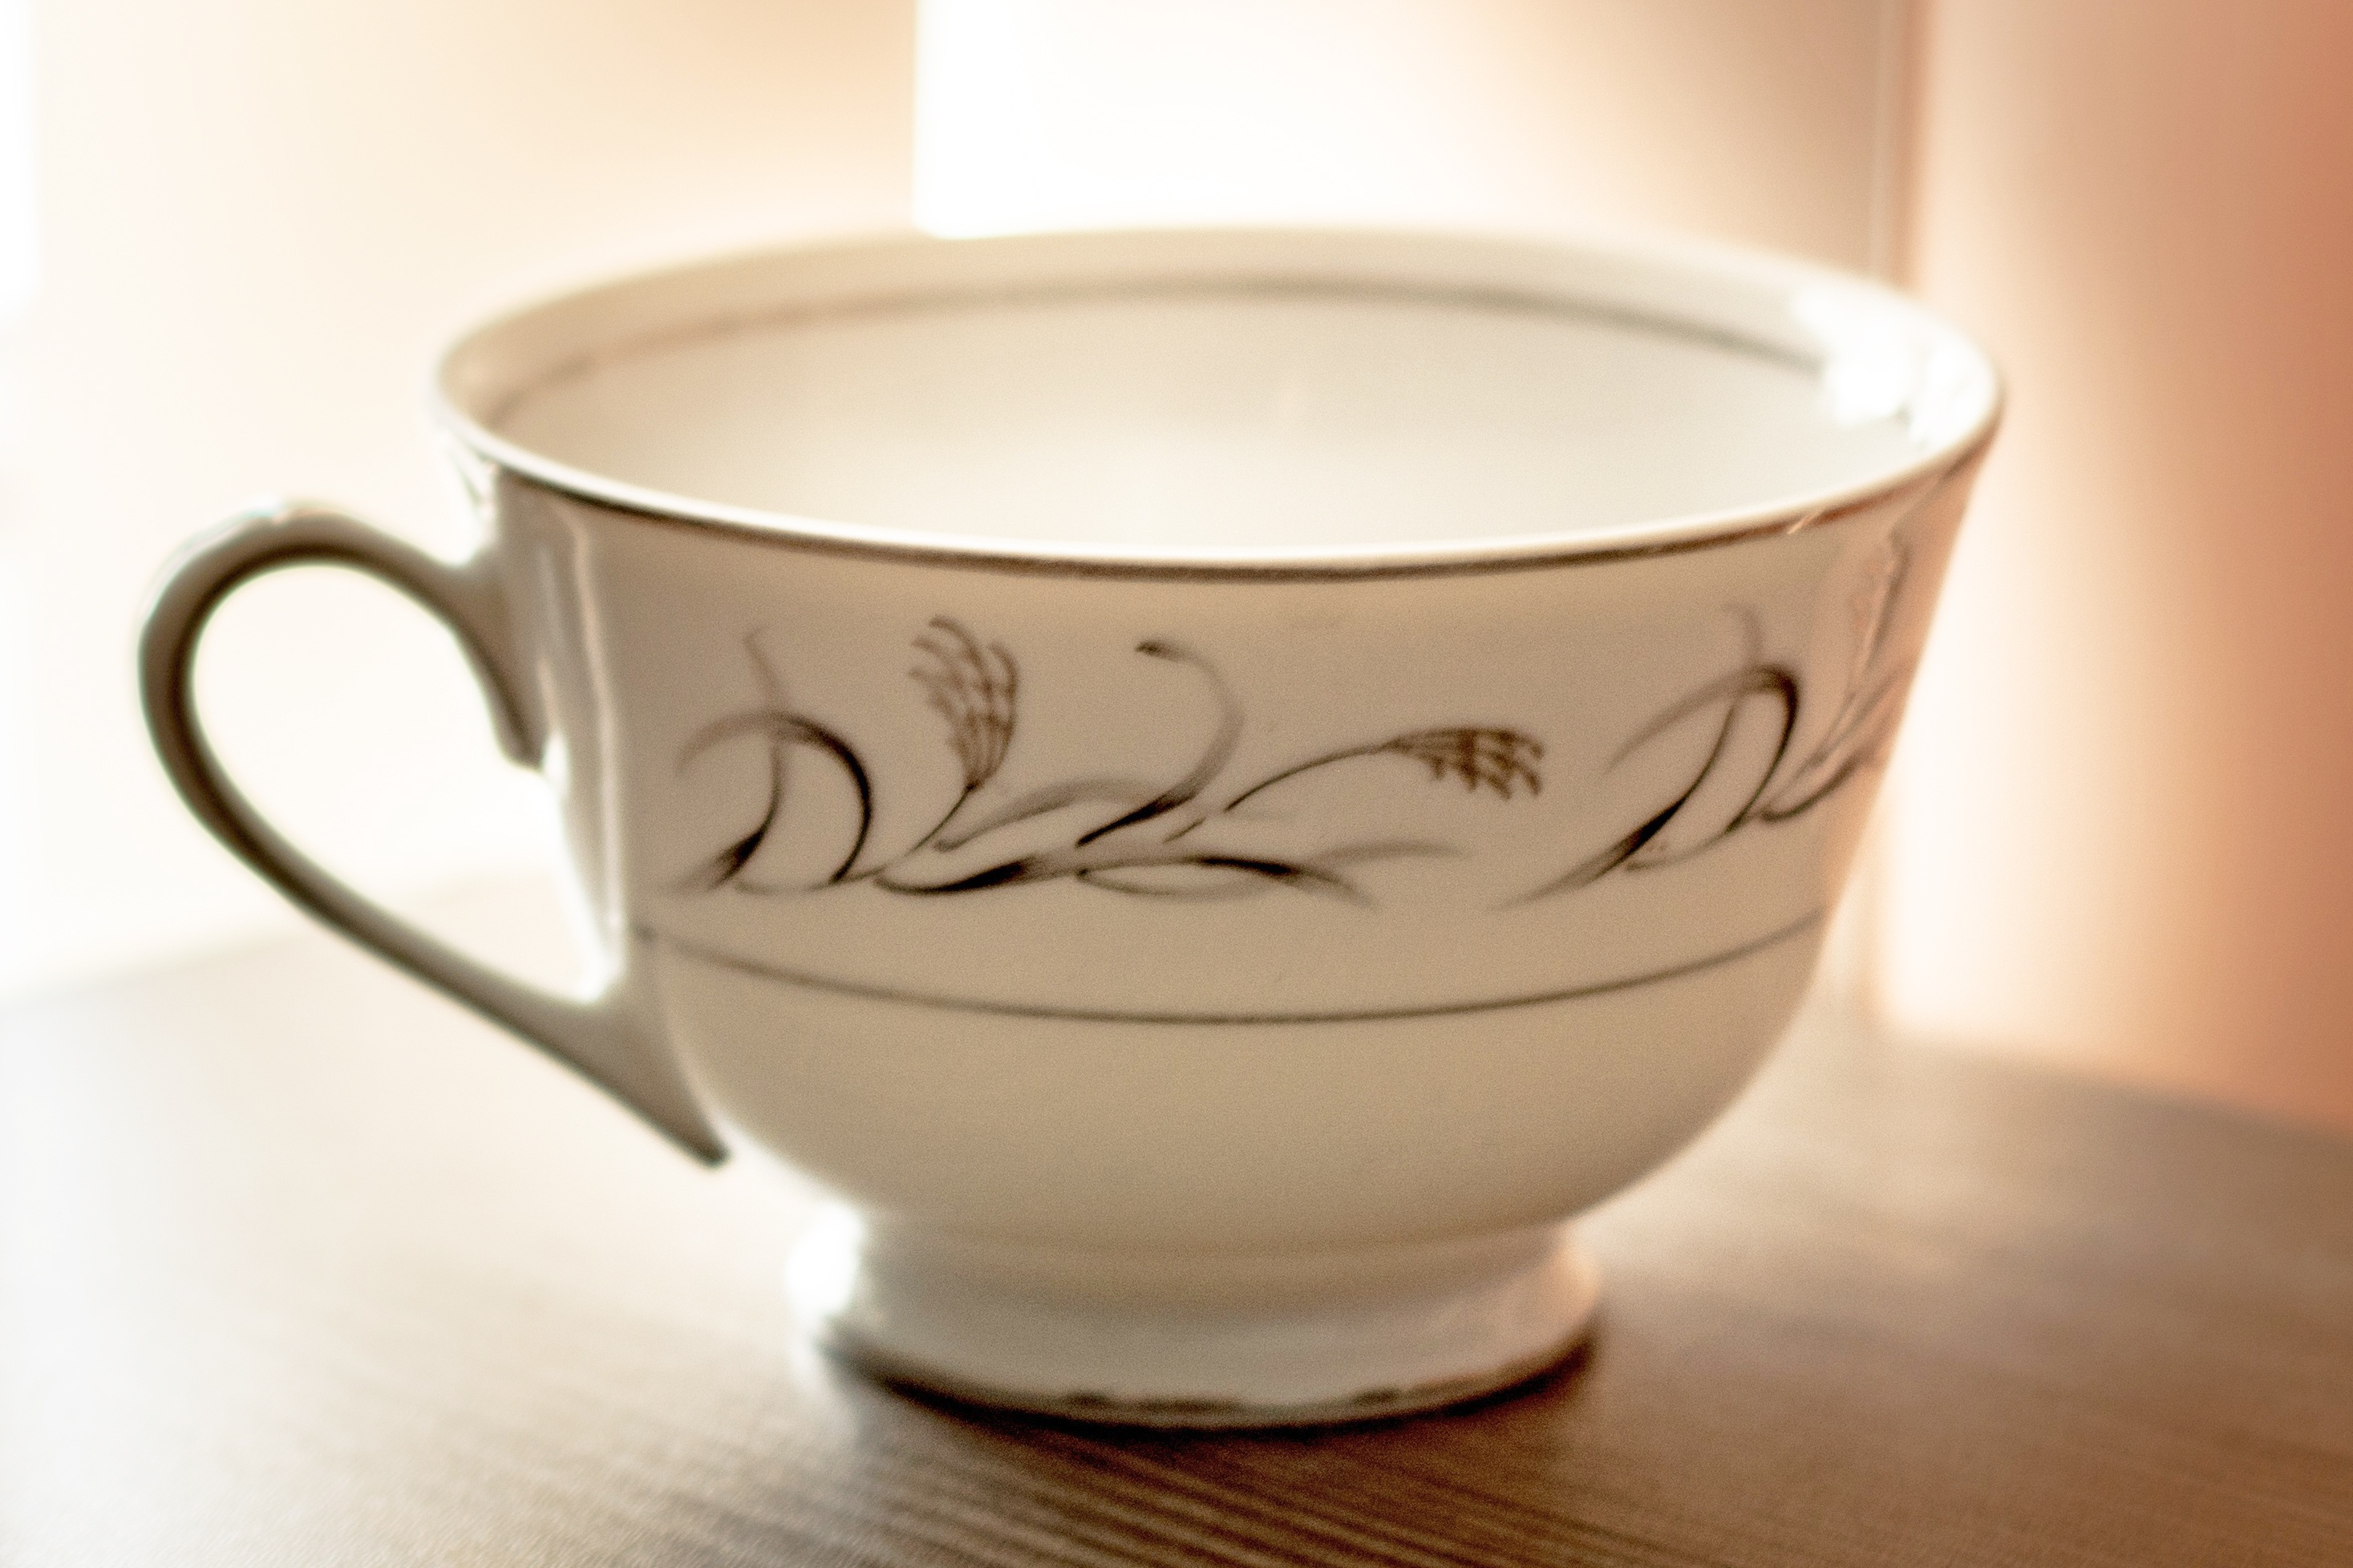 White porcelain teacup